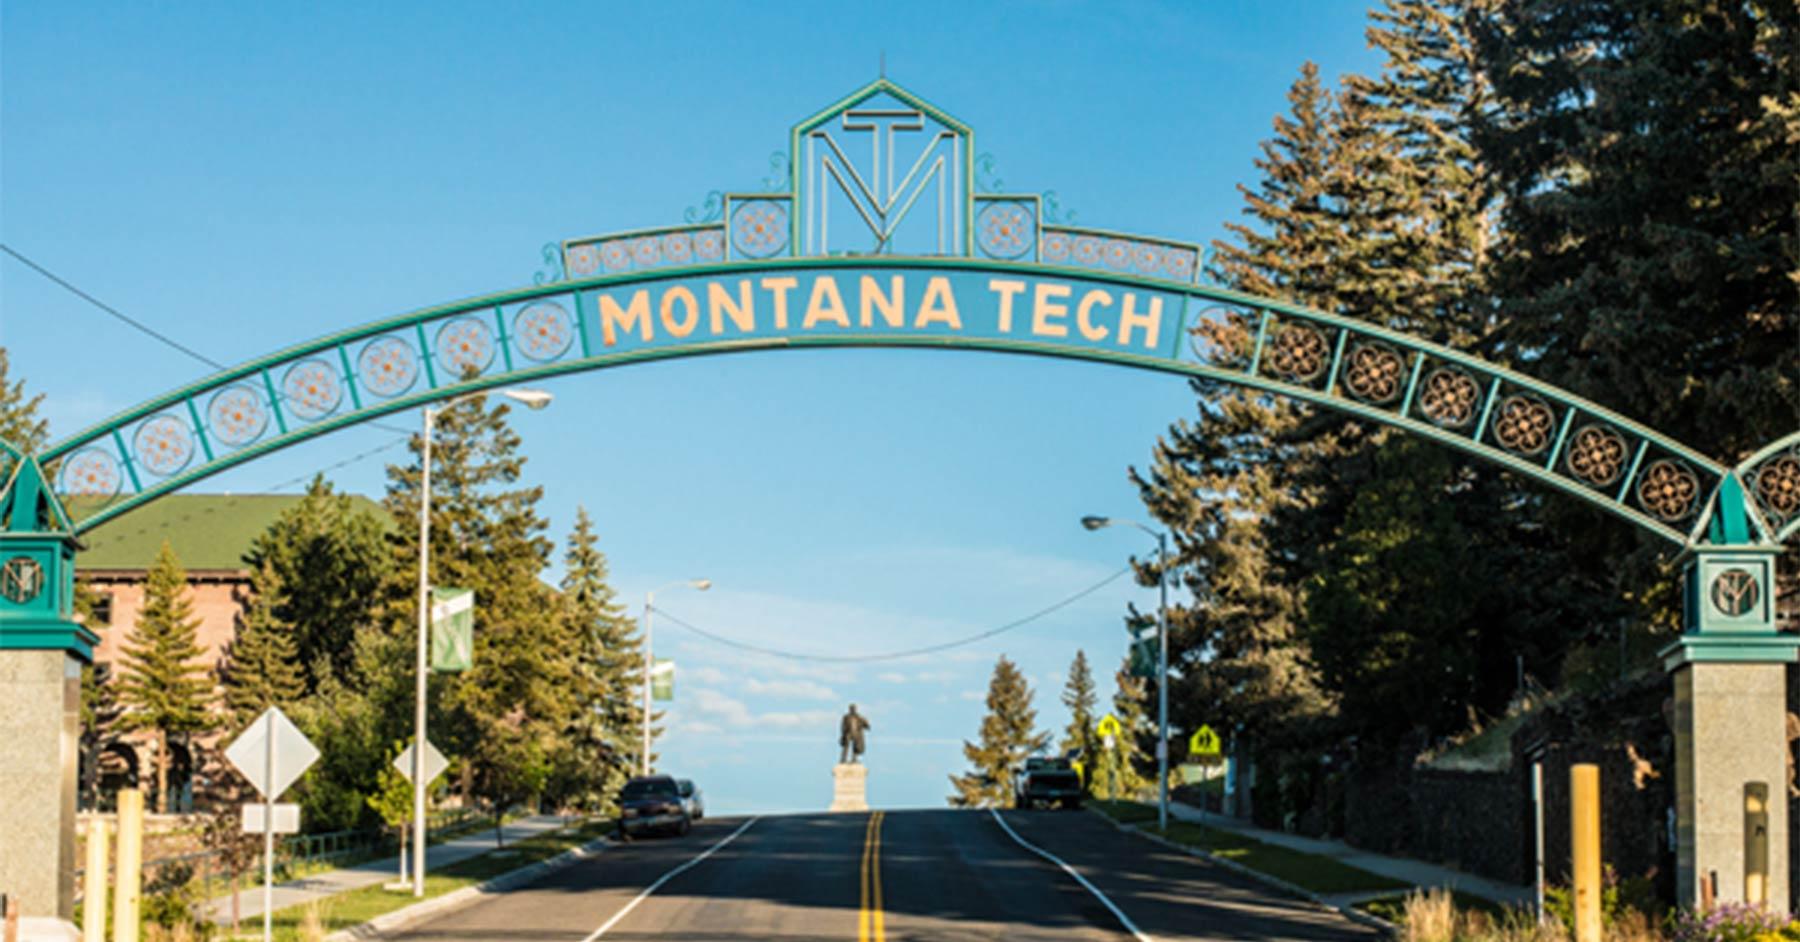 Montana Technological University - Niche